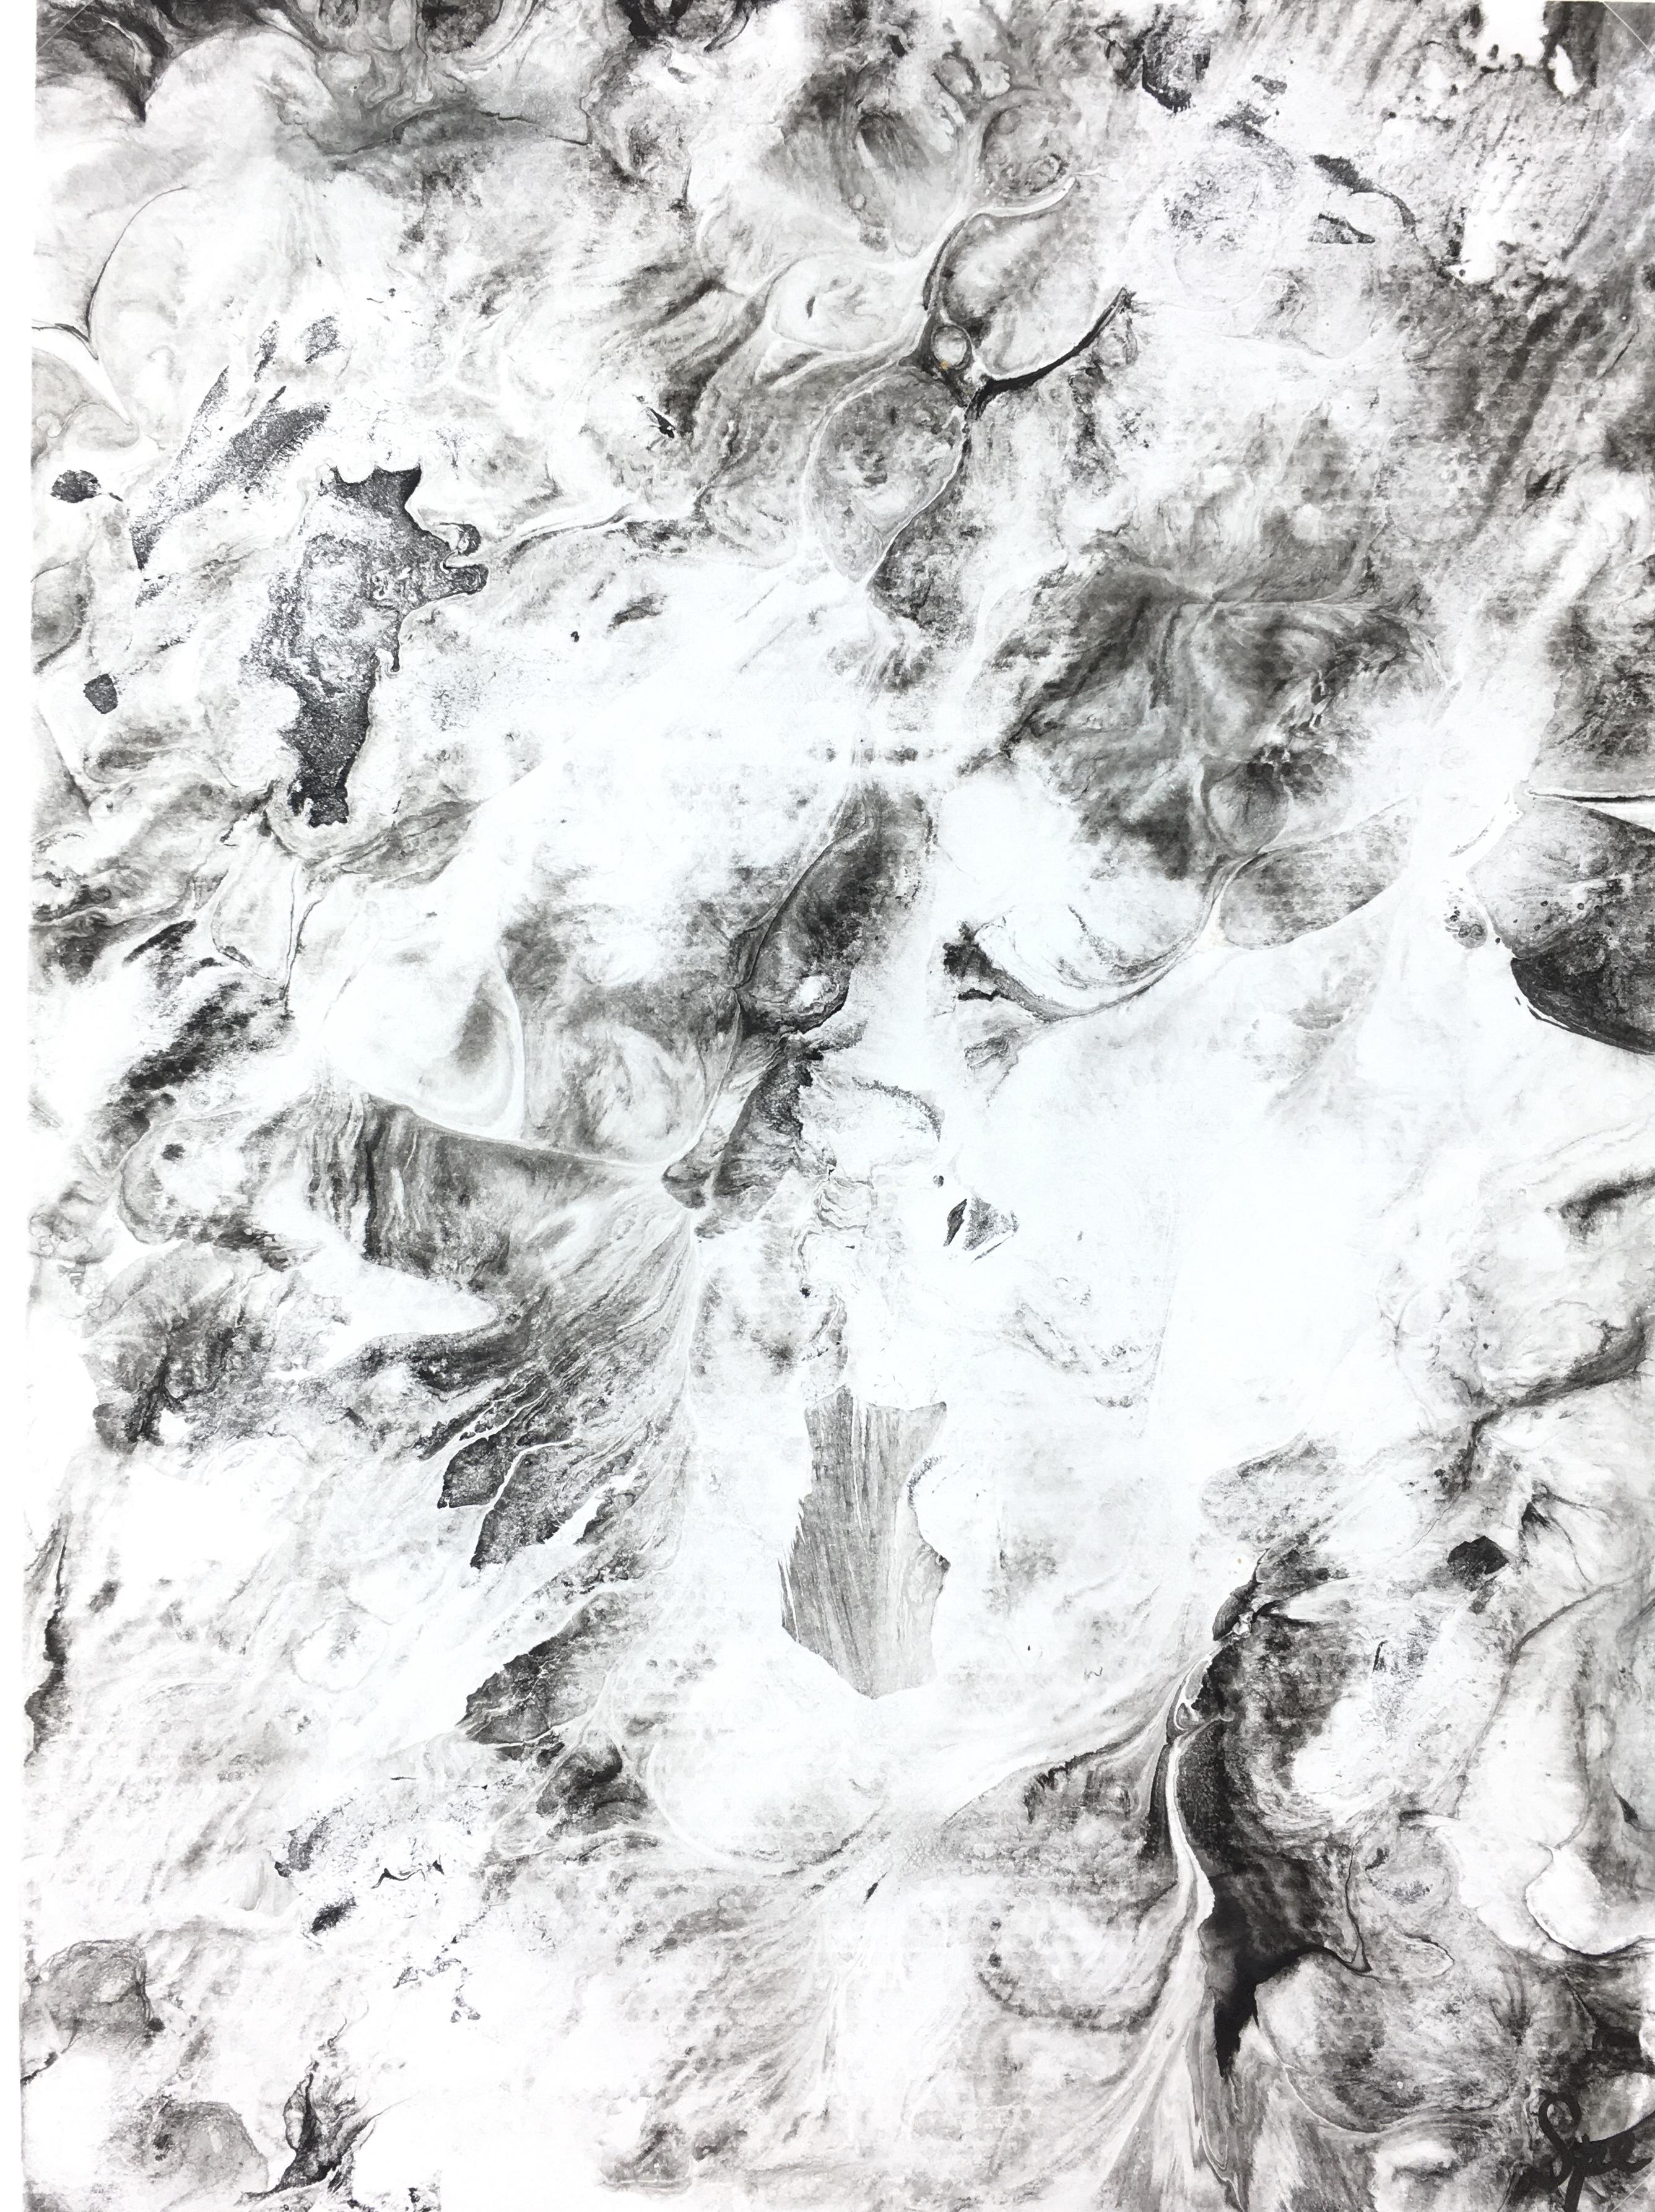 Modern Original Art - Suminagashi, Spe, 2018